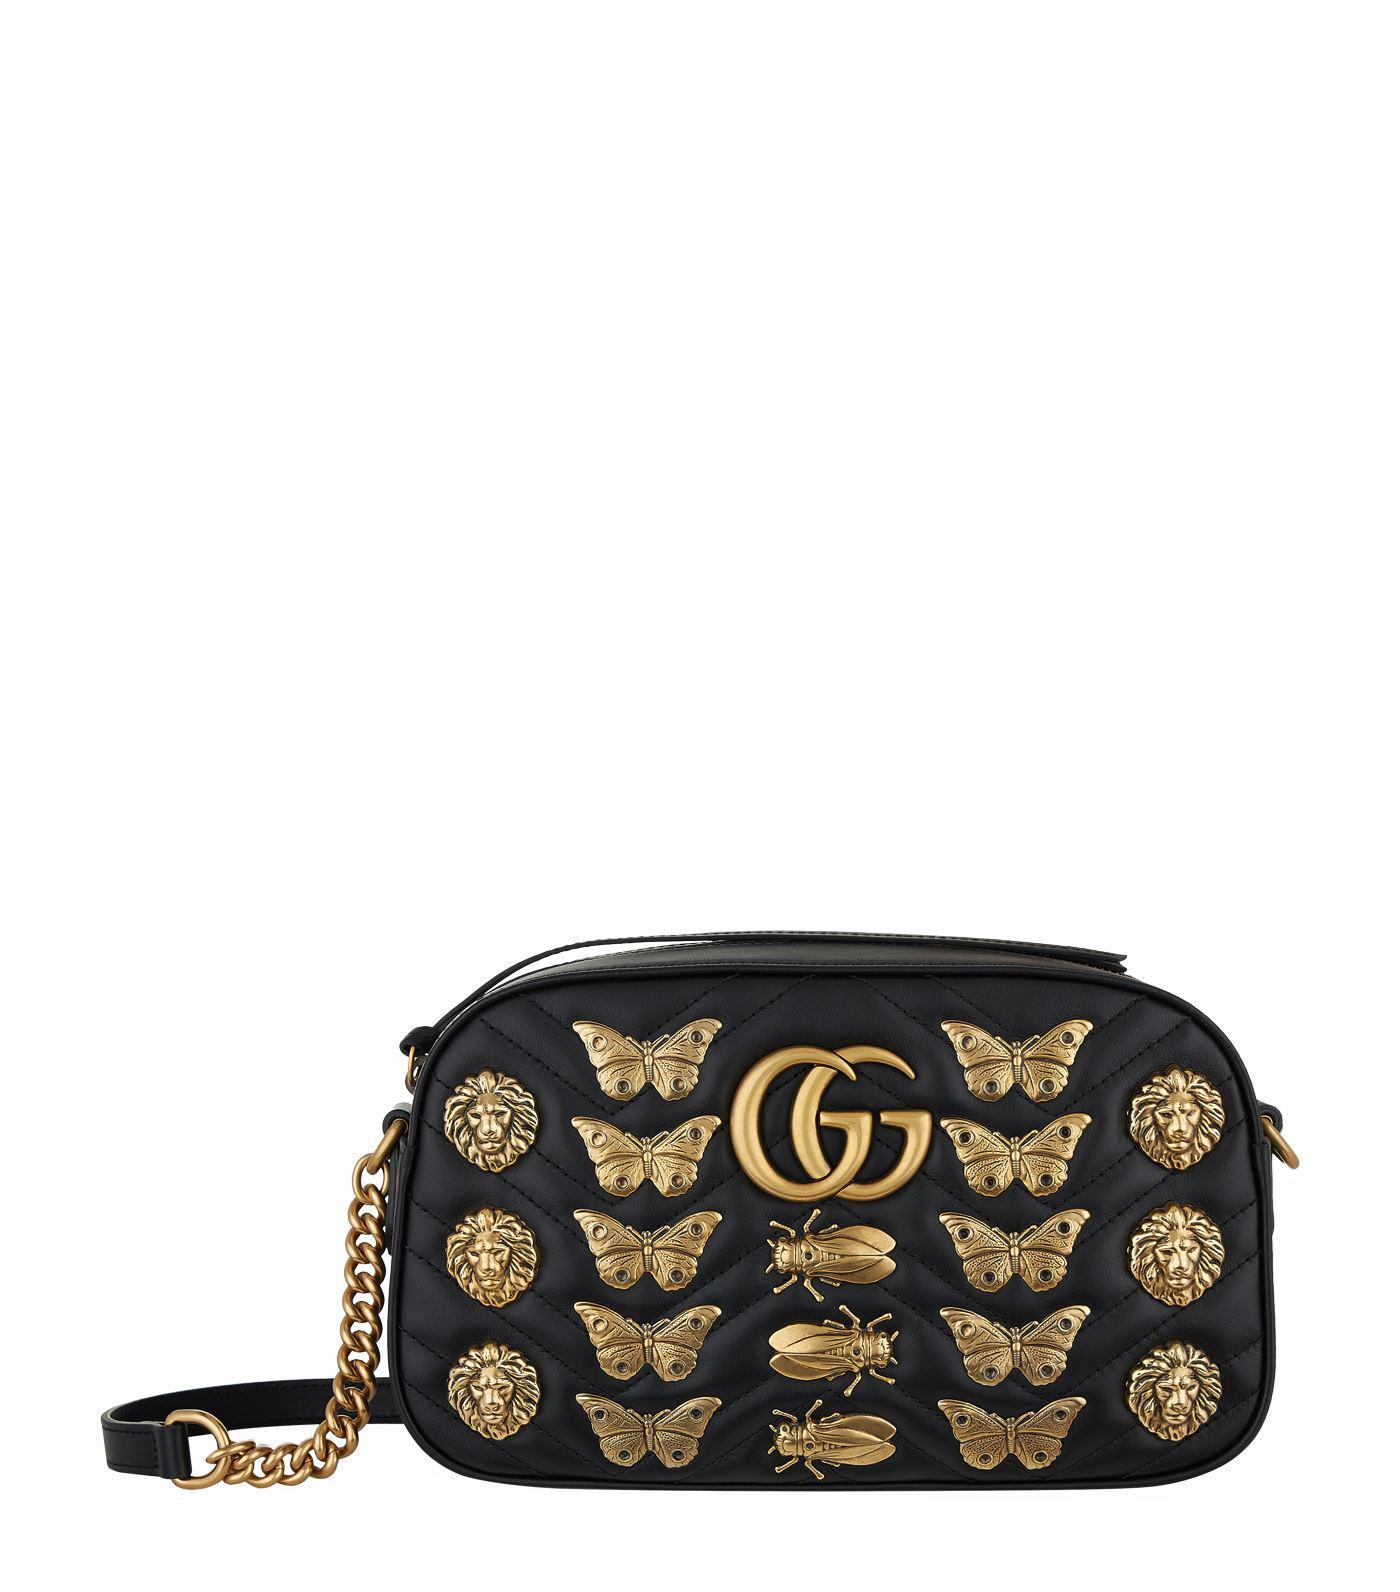 93cf27cfb93004 Gucci Marmont Bug Matelass Shoulder Bag in Black - Lyst